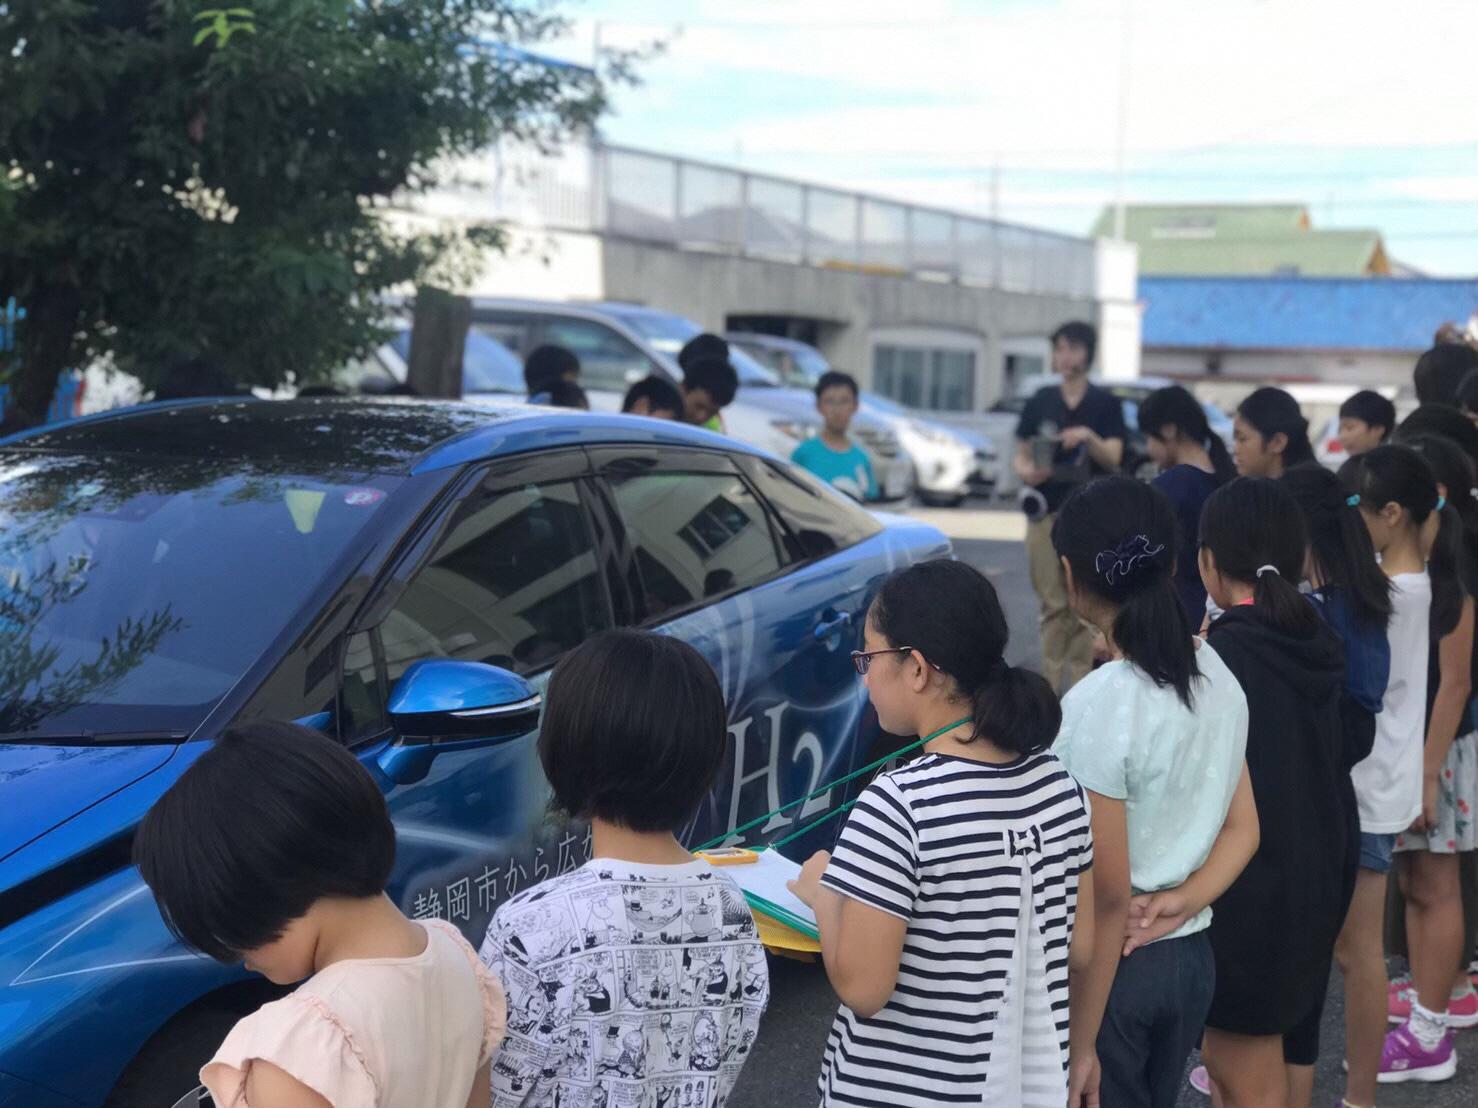 http://www.shizutan.jp/ondanka/event/2020/01/06/images/IMG-3976.JPG